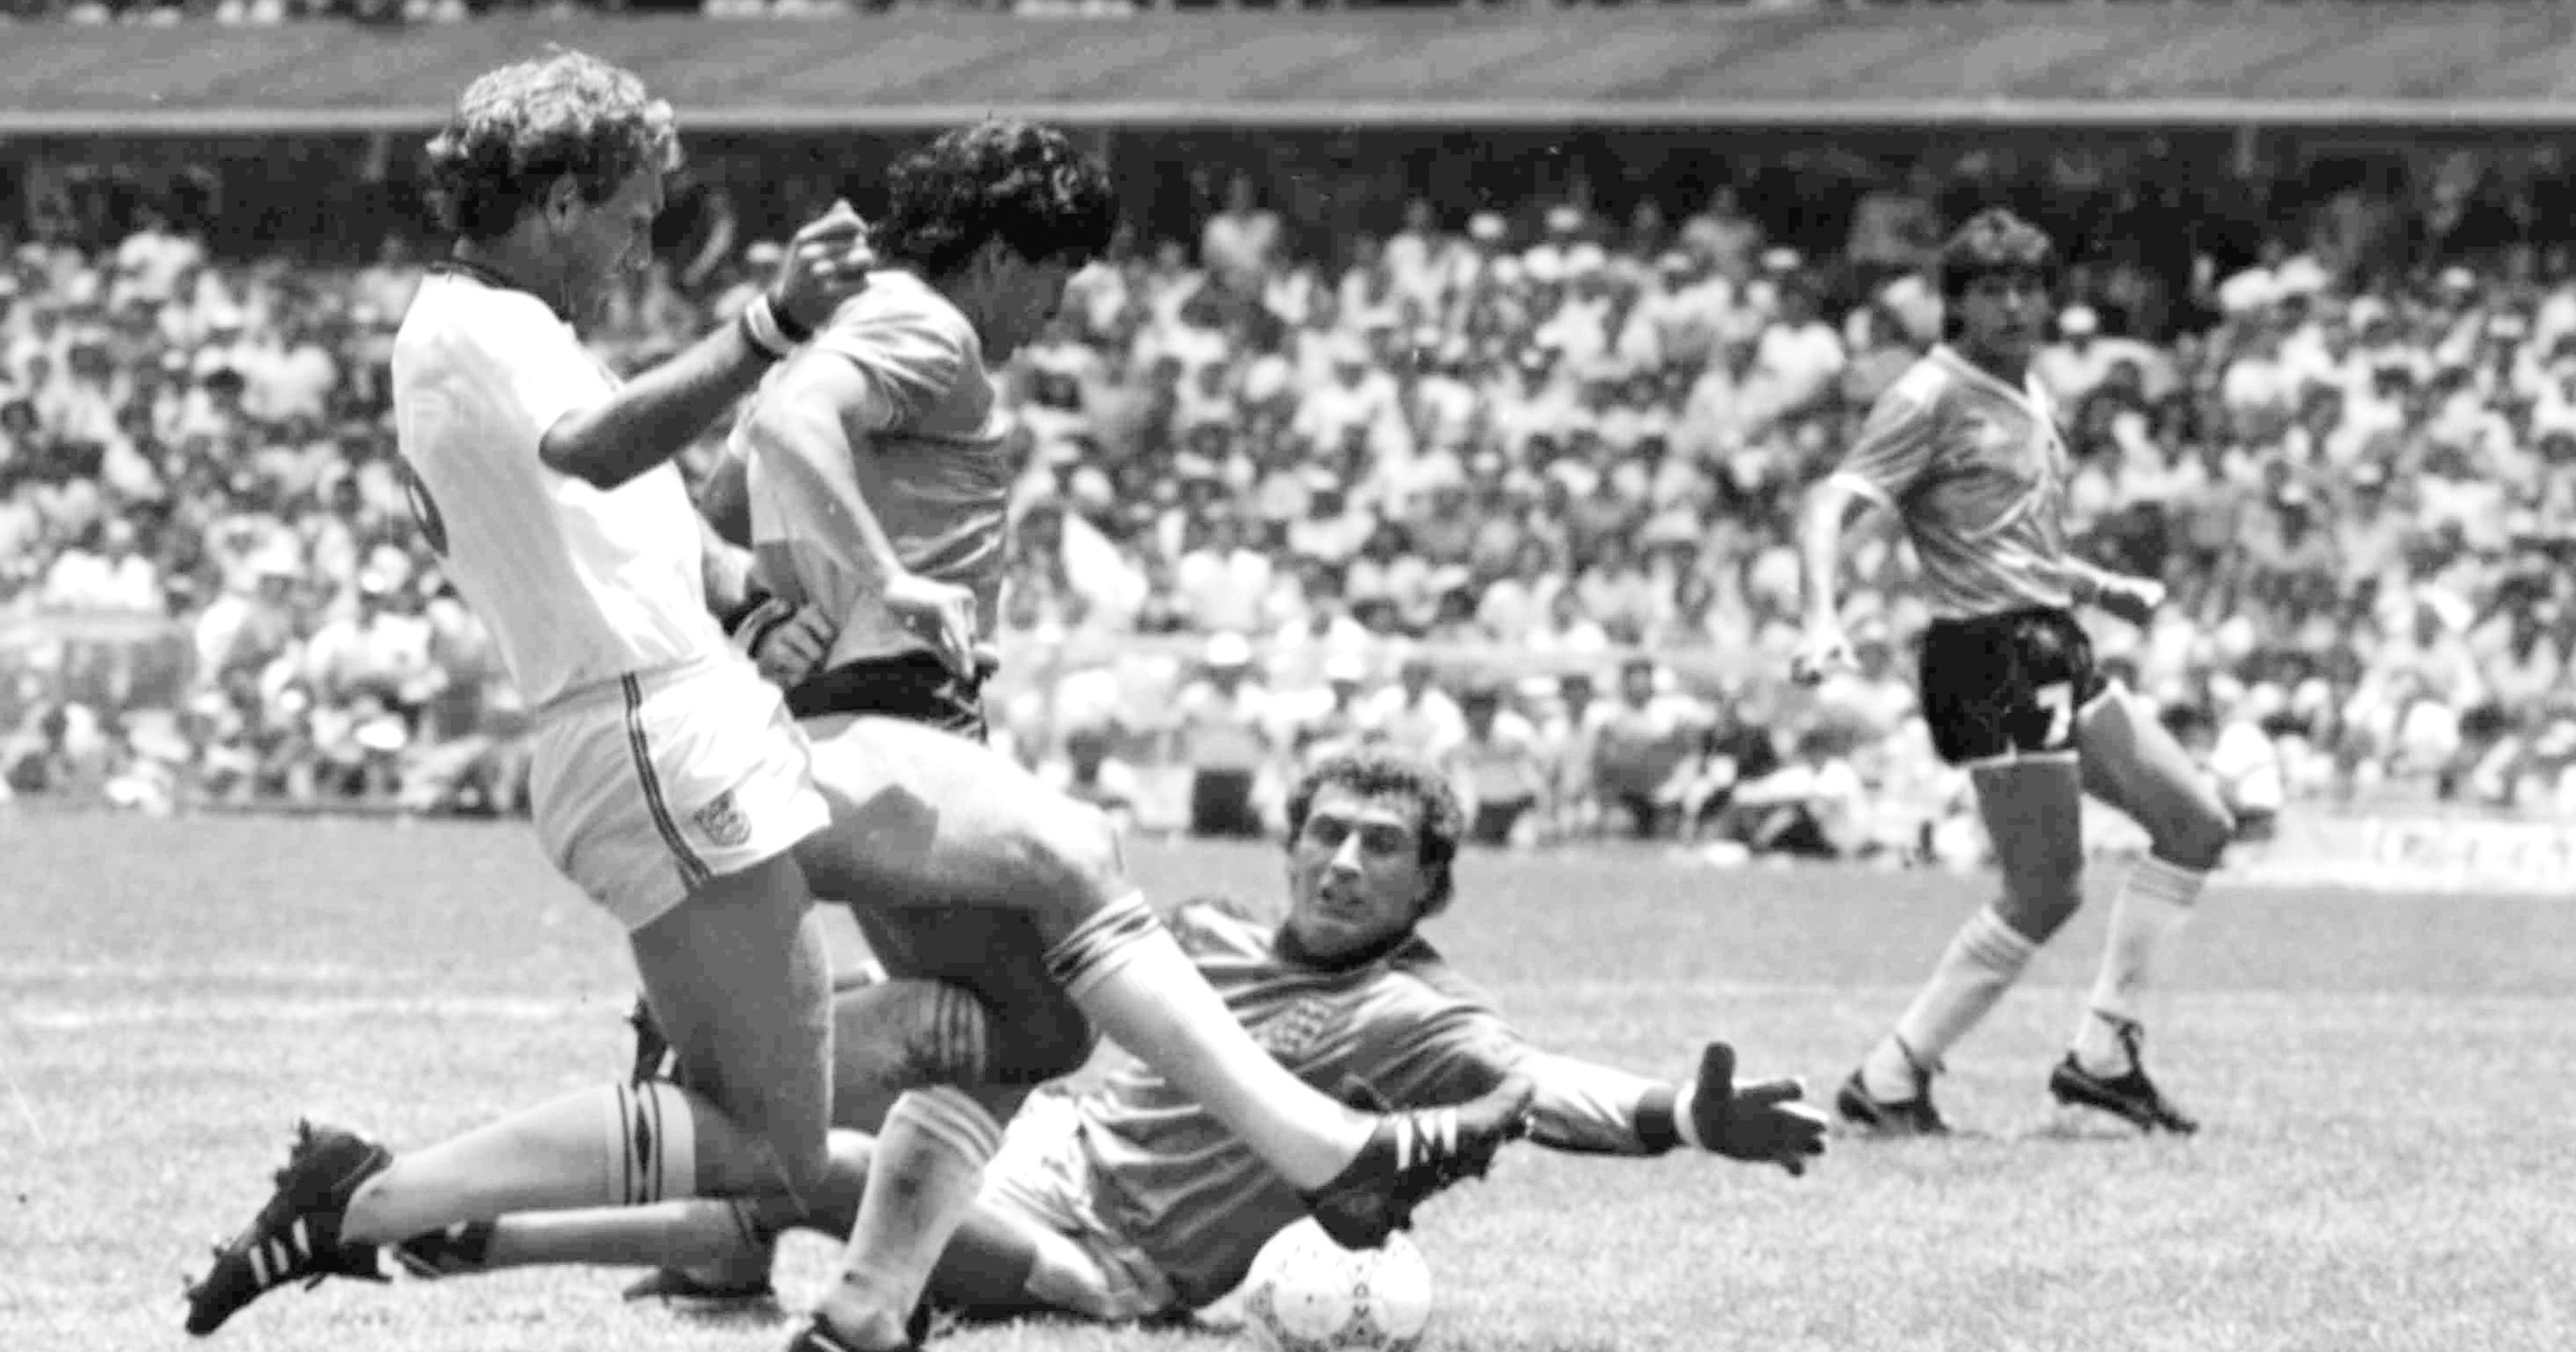 WORLD CUP: Maradona's 'Hand of God' goal in 1986